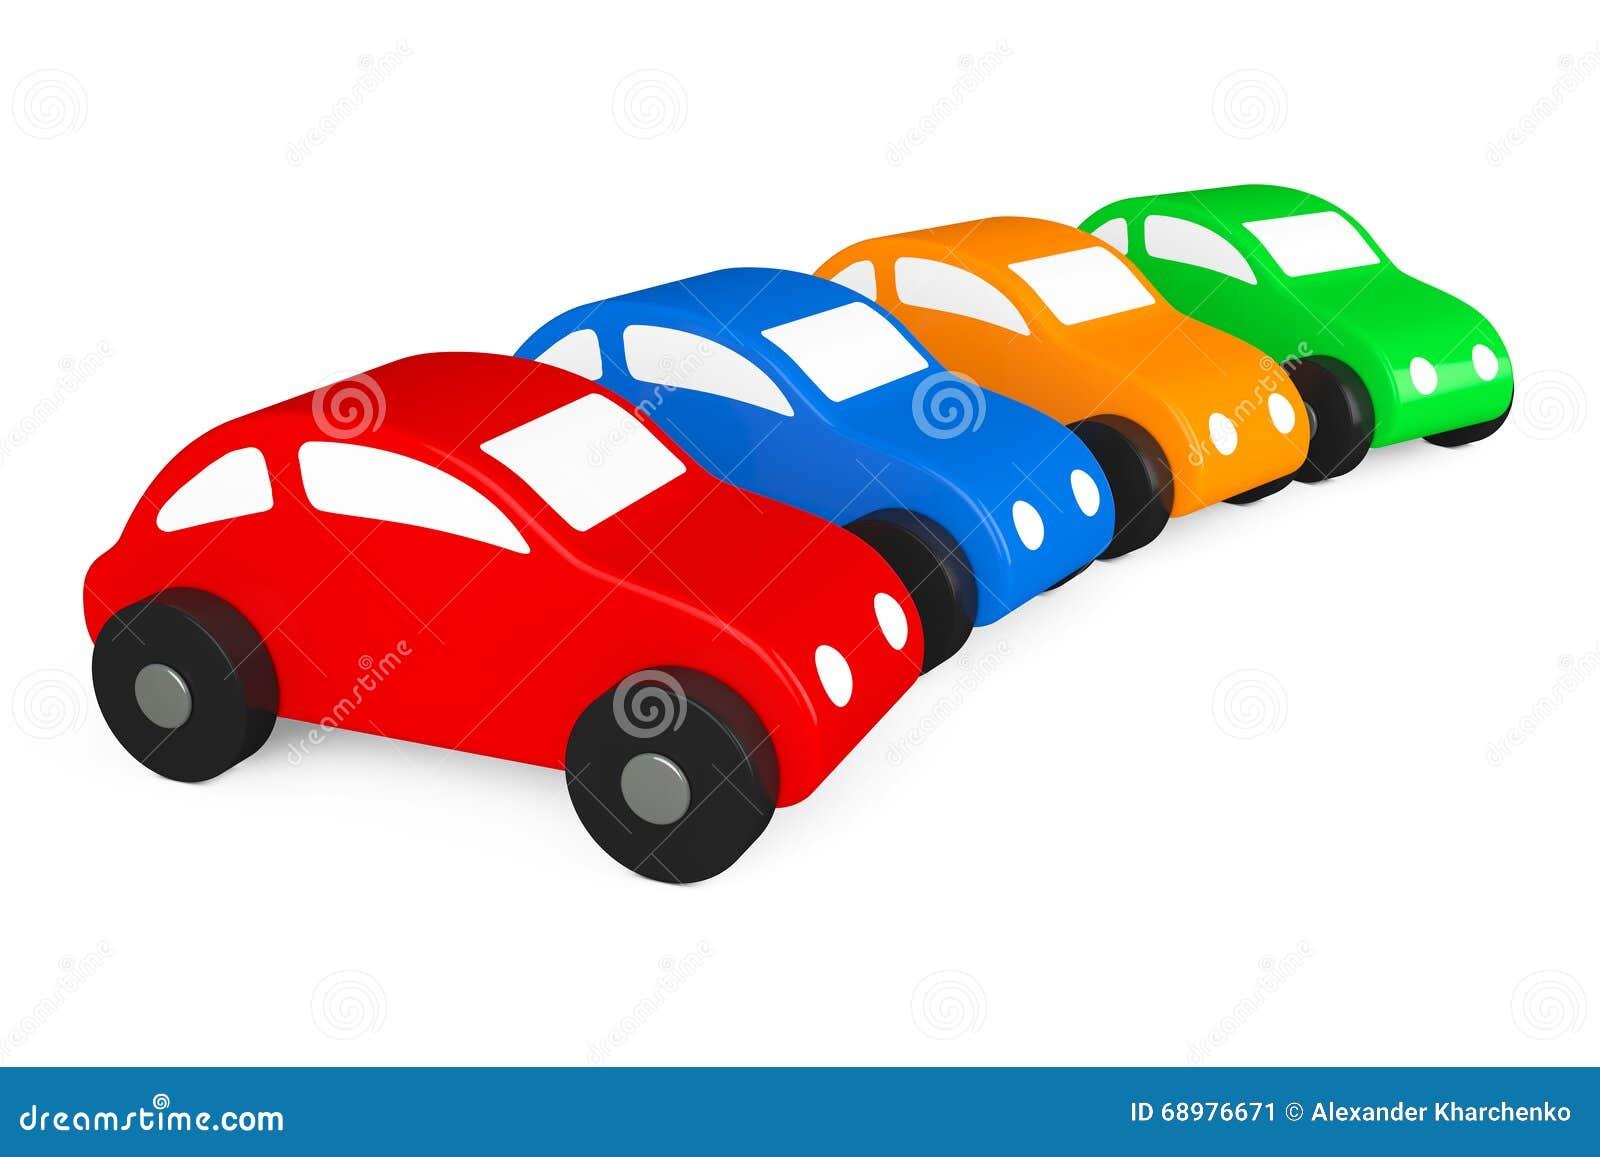 Multicolour Cartoon Toy Cars Stock Illustration